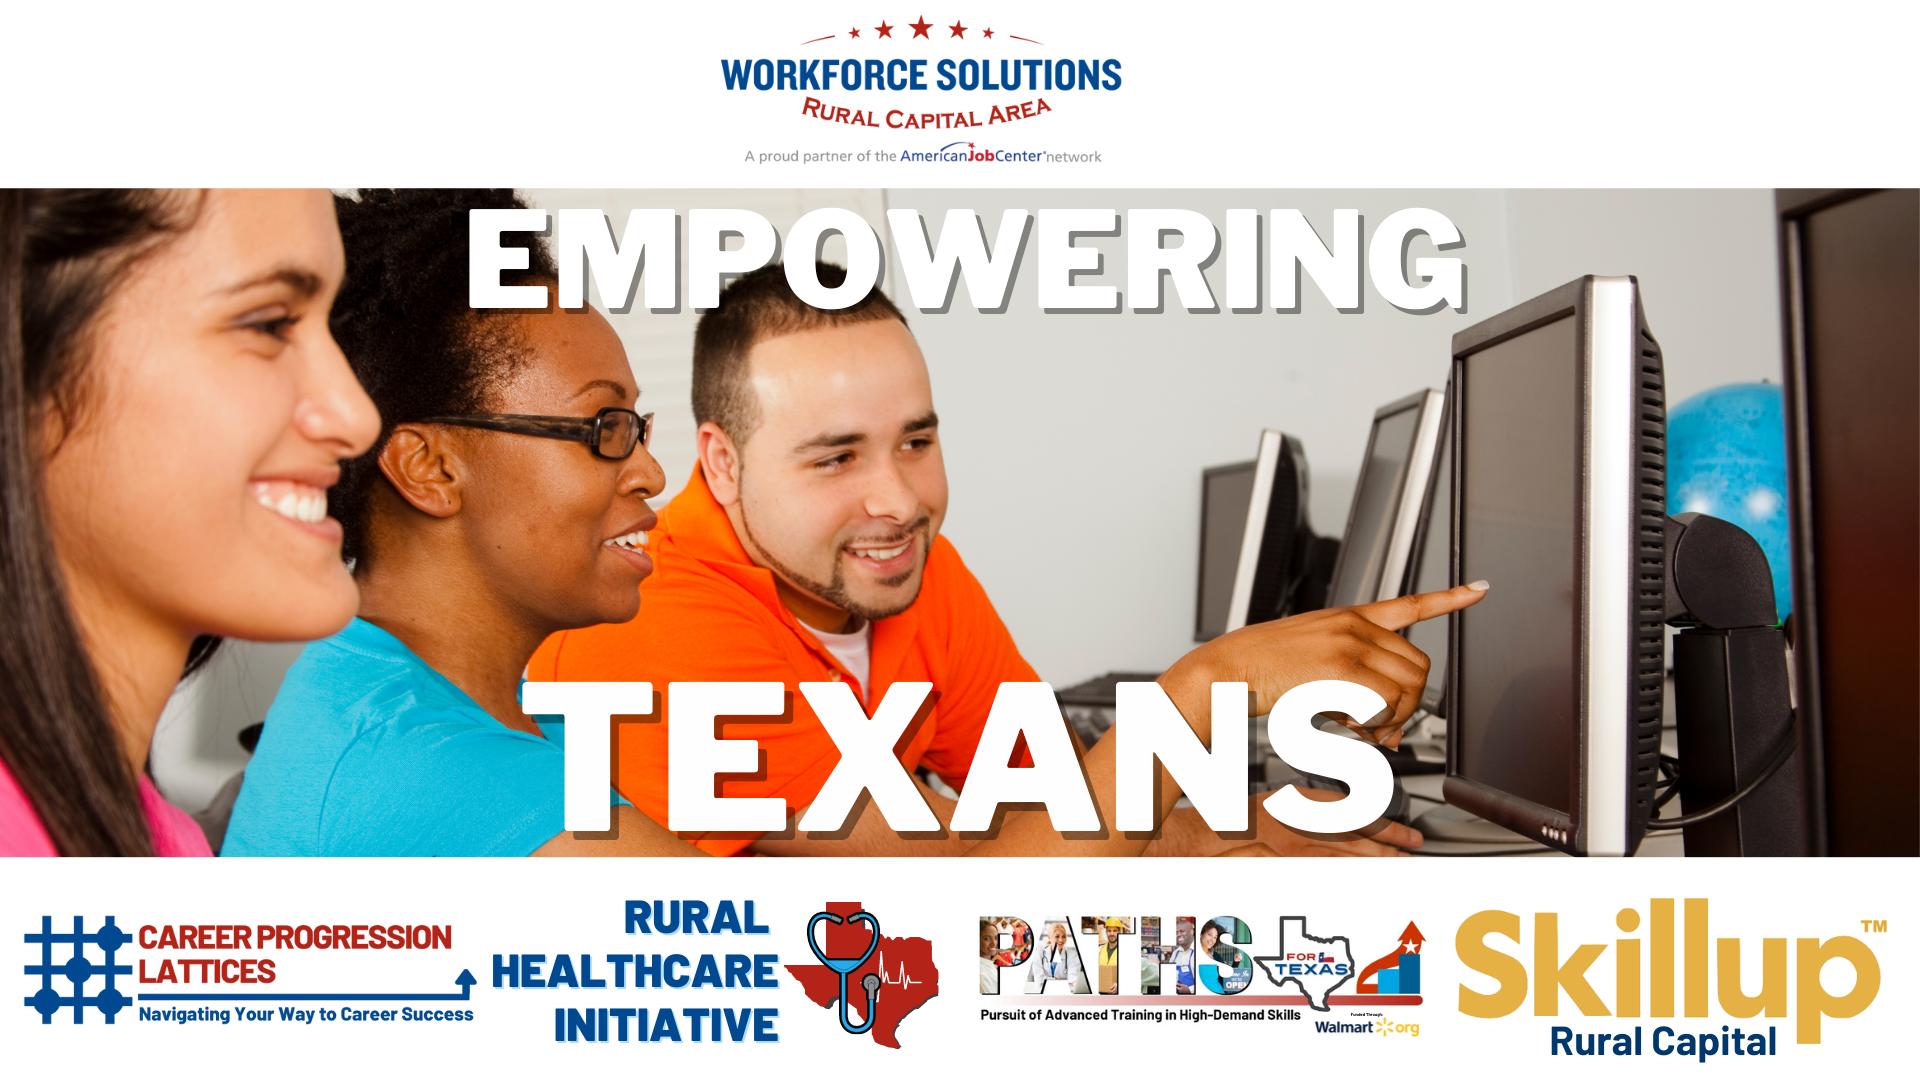 Workforce Solutions Rural Capital Area Upskilling Tools